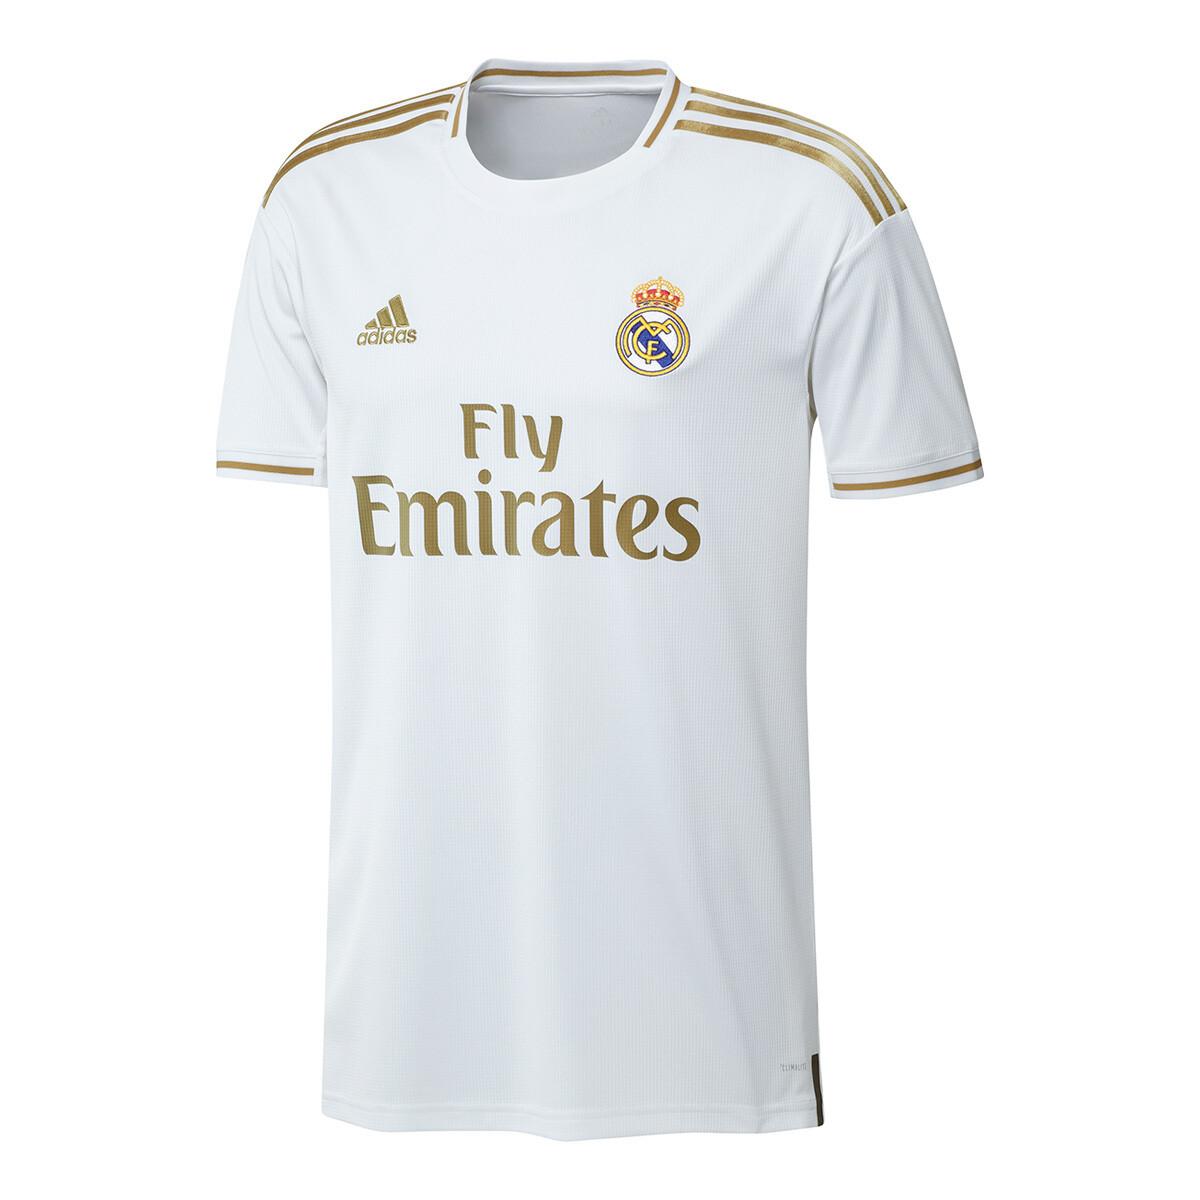 Camisa do Real Madrid I 19/20 Home